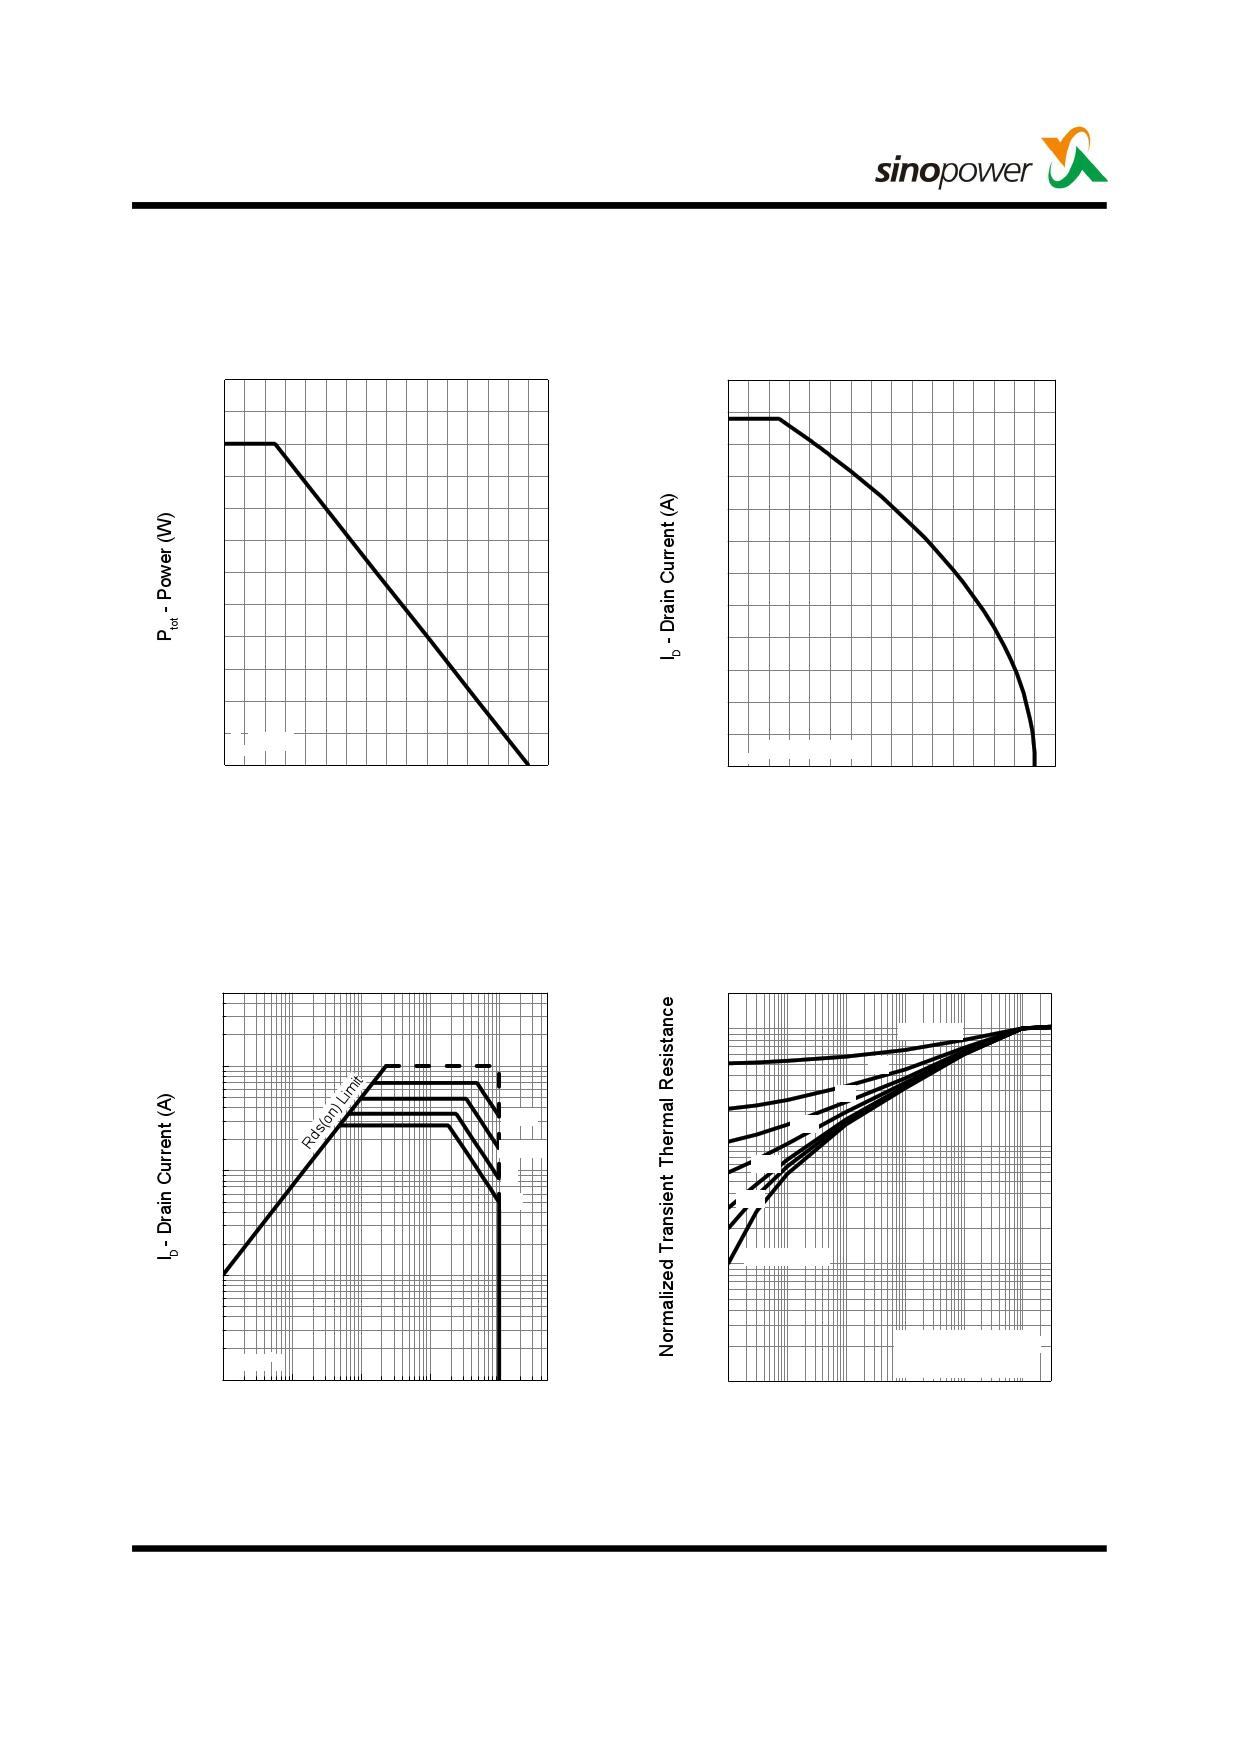 APM1110K pdf, 반도체, 판매, 대치품